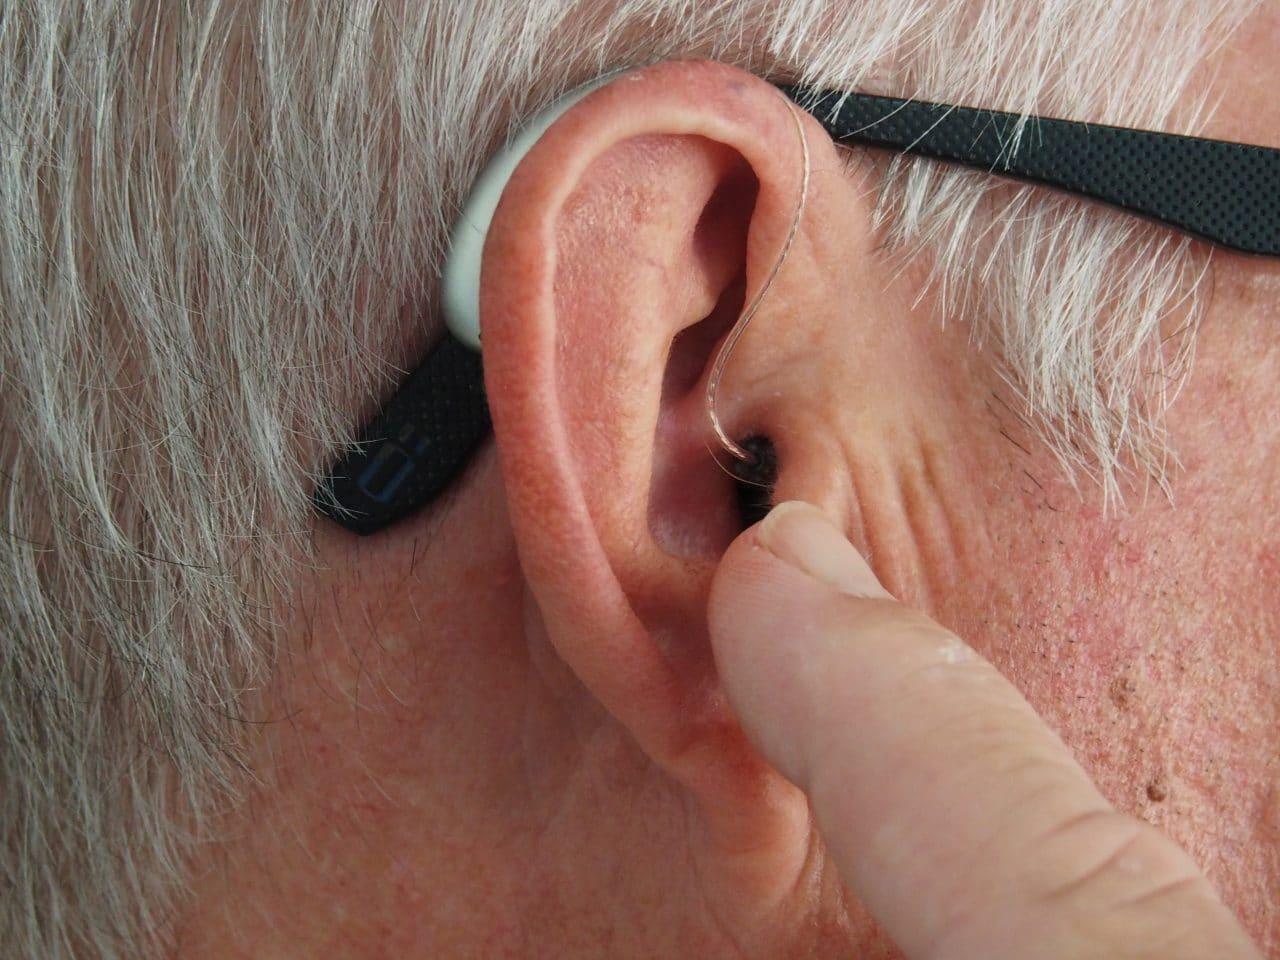 Man points at his hearing aid.